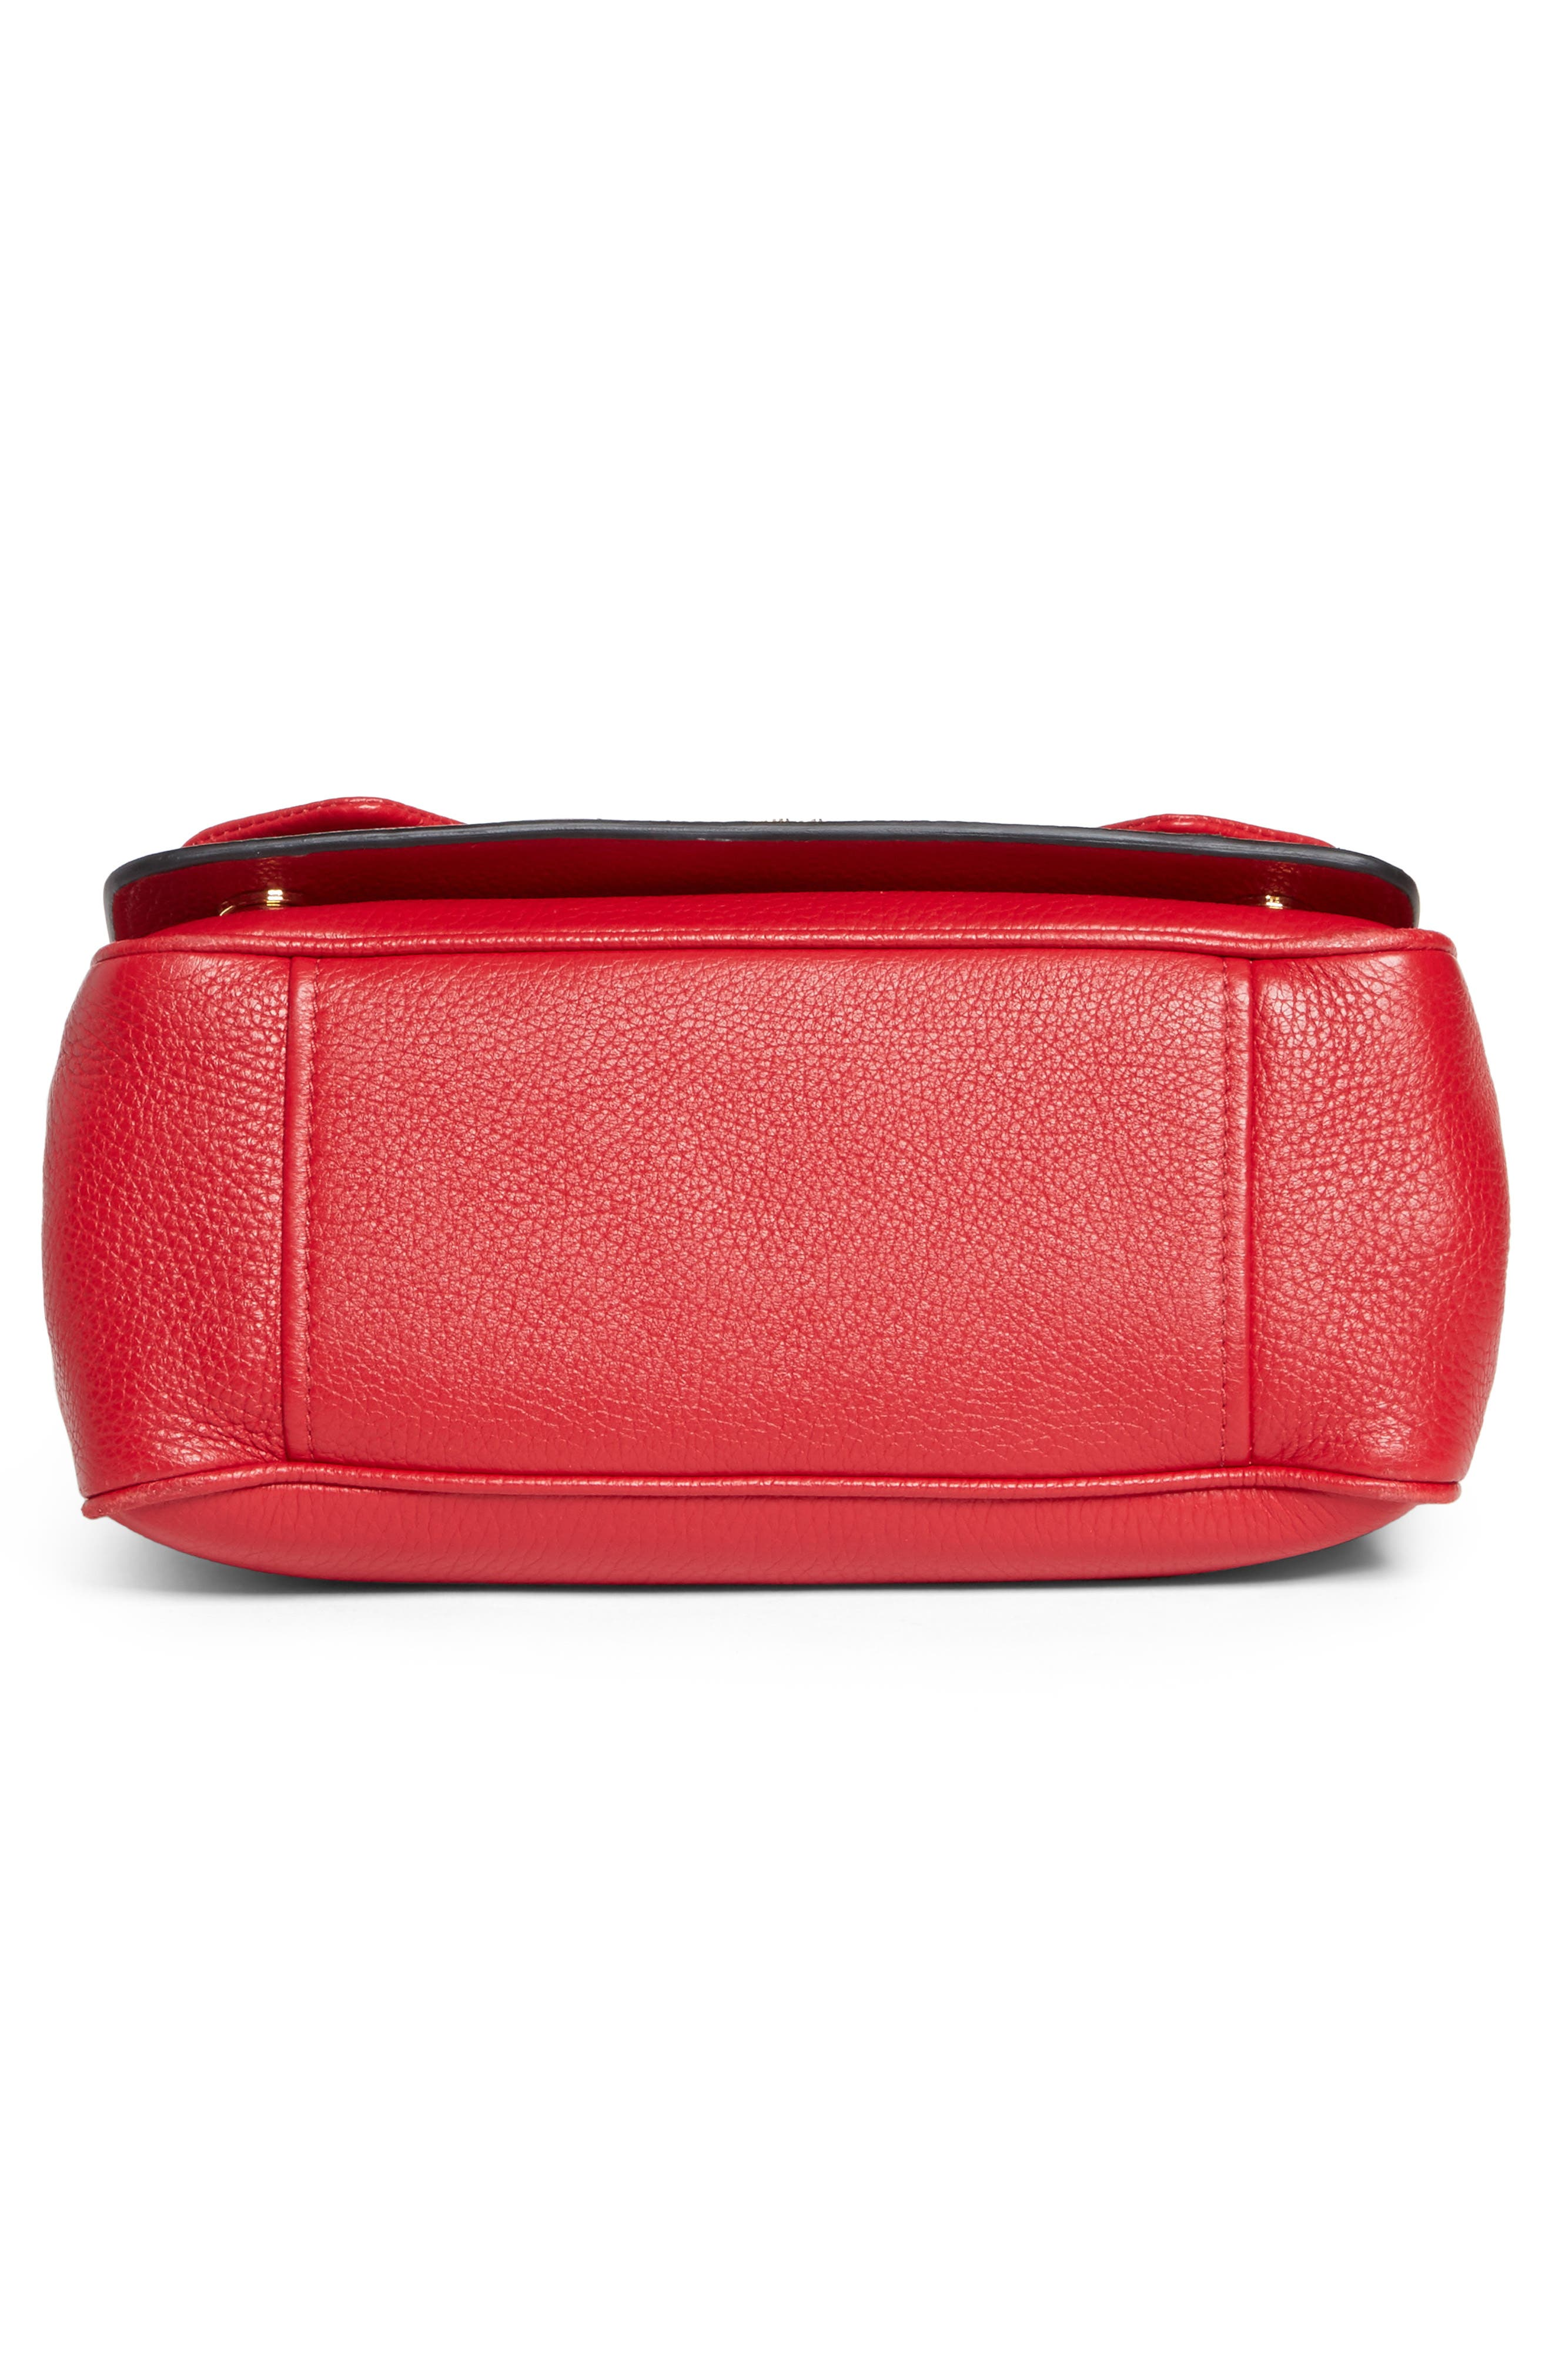 Grainy-B Leather Crossbody Bag,                             Alternate thumbnail 12, color,